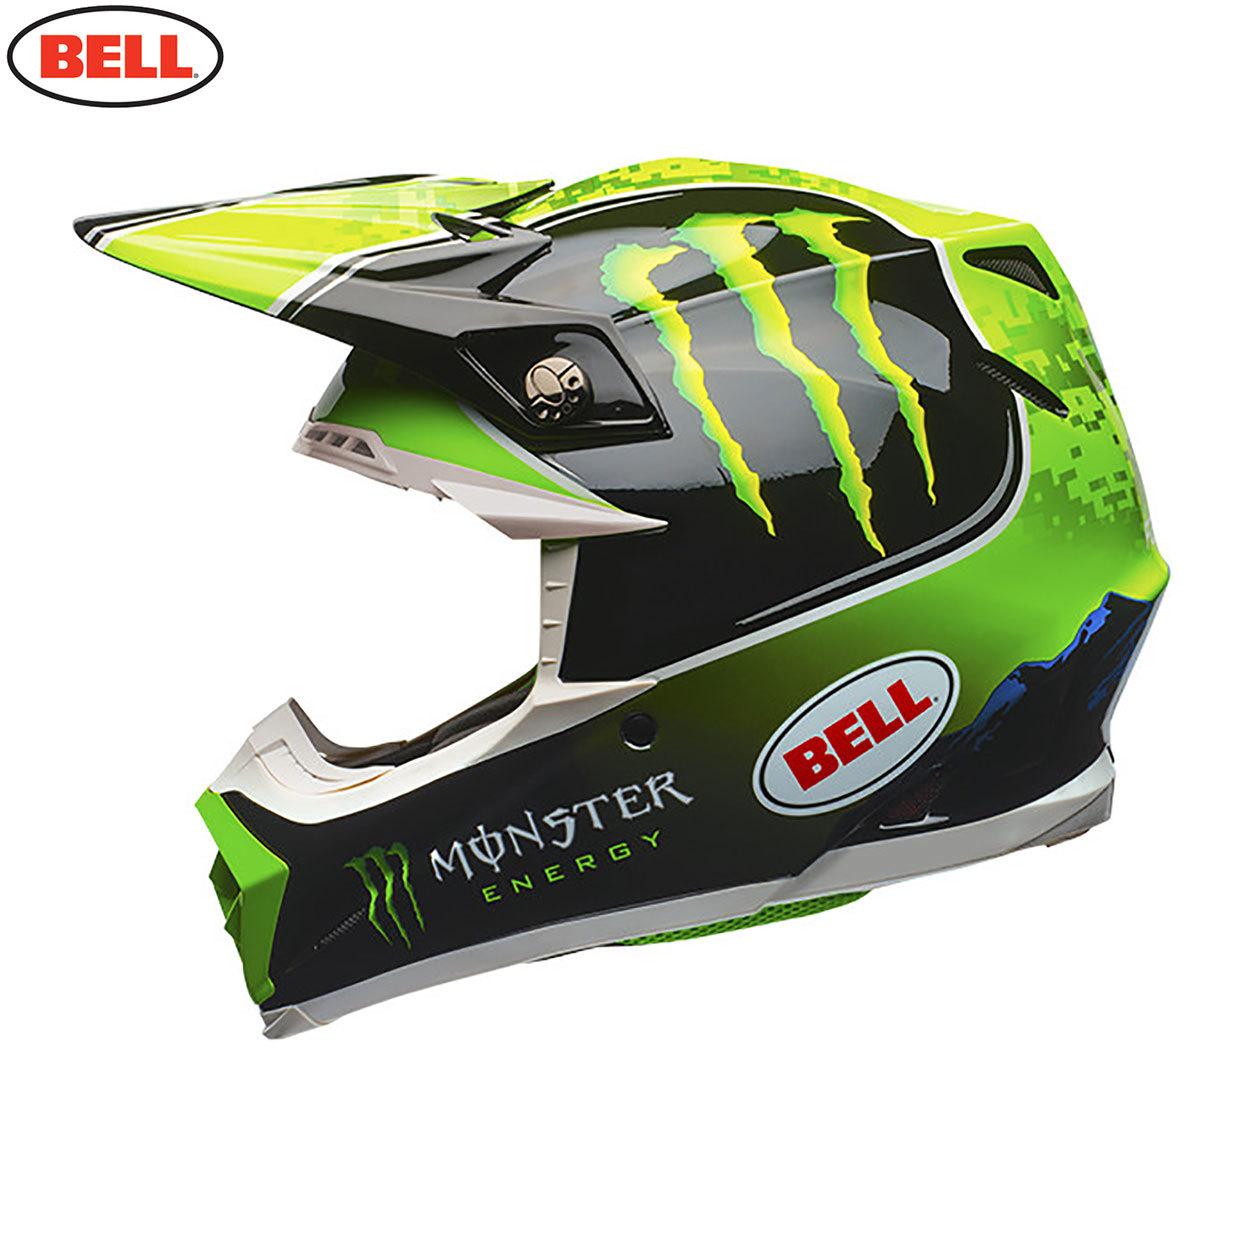 Casque Shoei 2018 >> Bell MX Moto-9 Adult Helmet (Tomac Monster Replica) - Midwest Racing